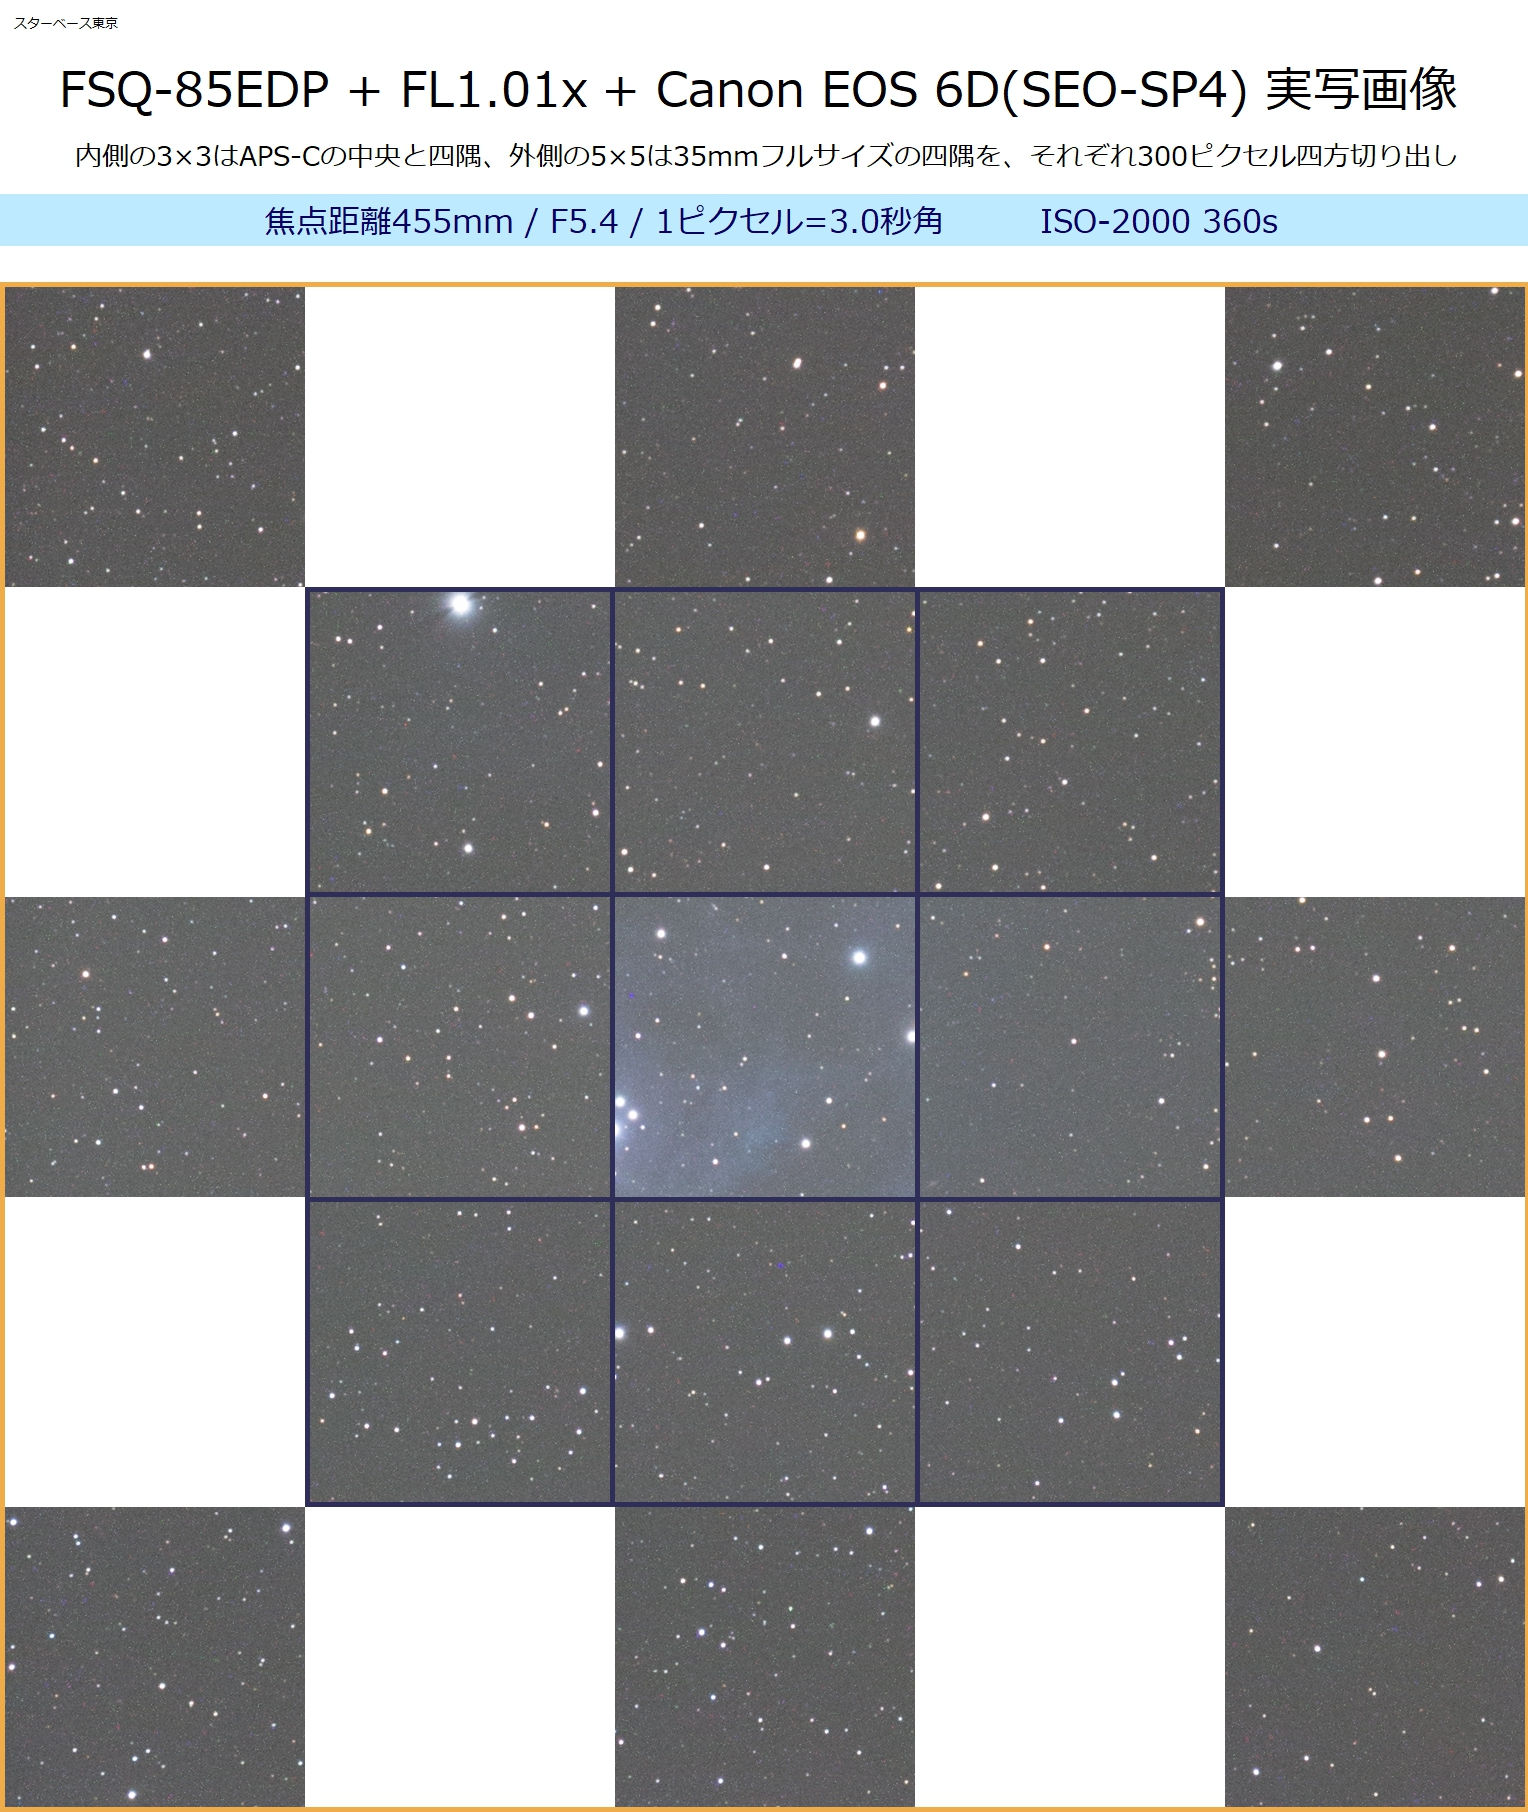 f:id:starbase:20180429140102j:plain